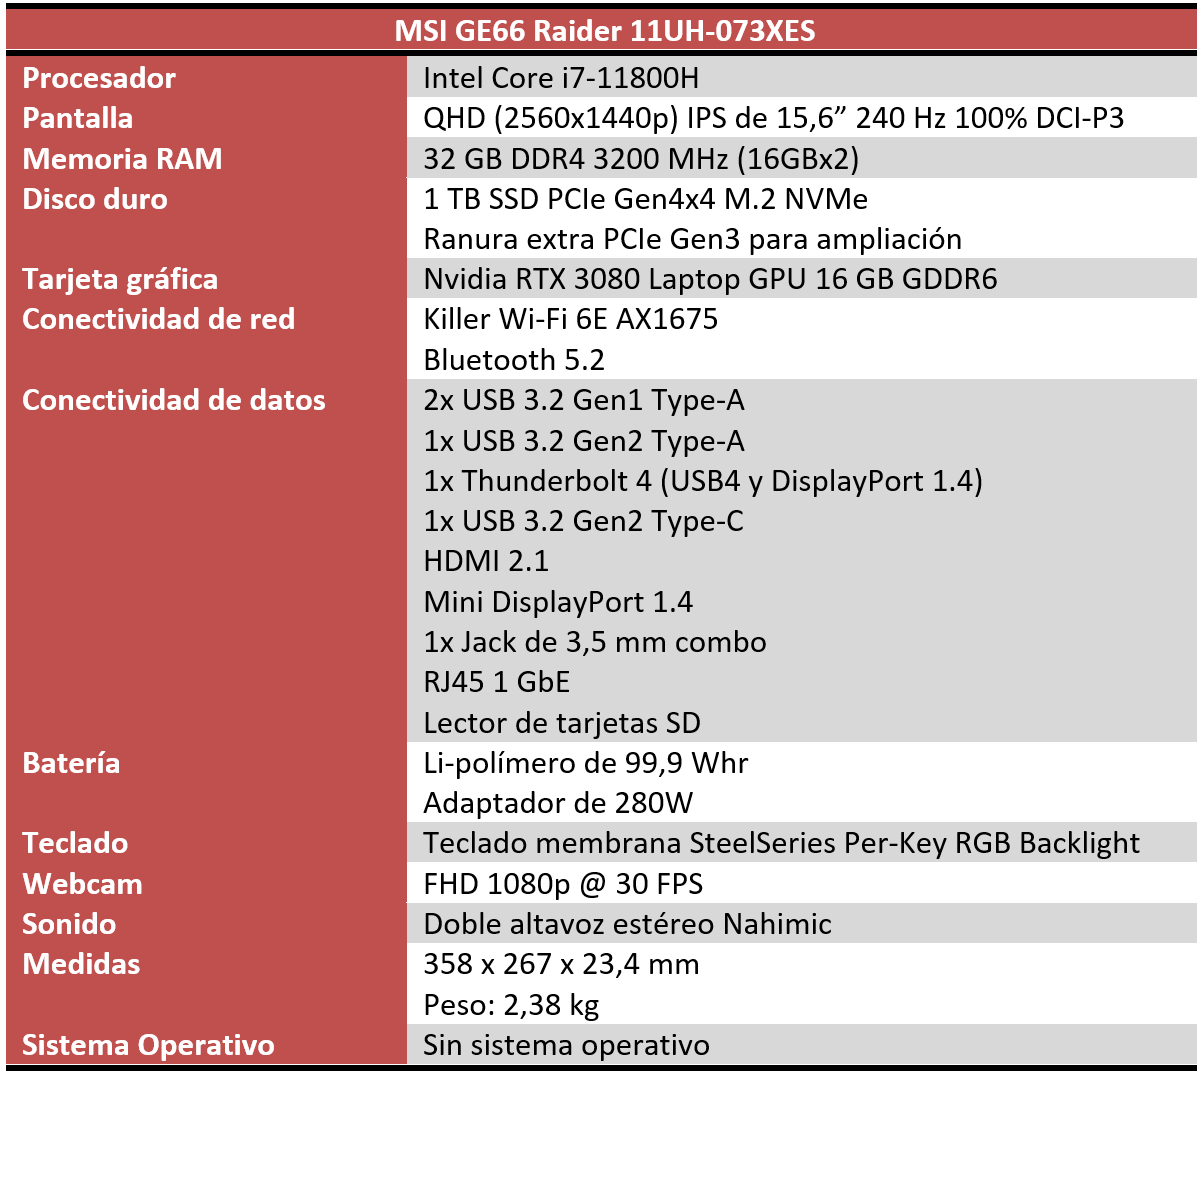 MSI GE66 Raider 11UH Características